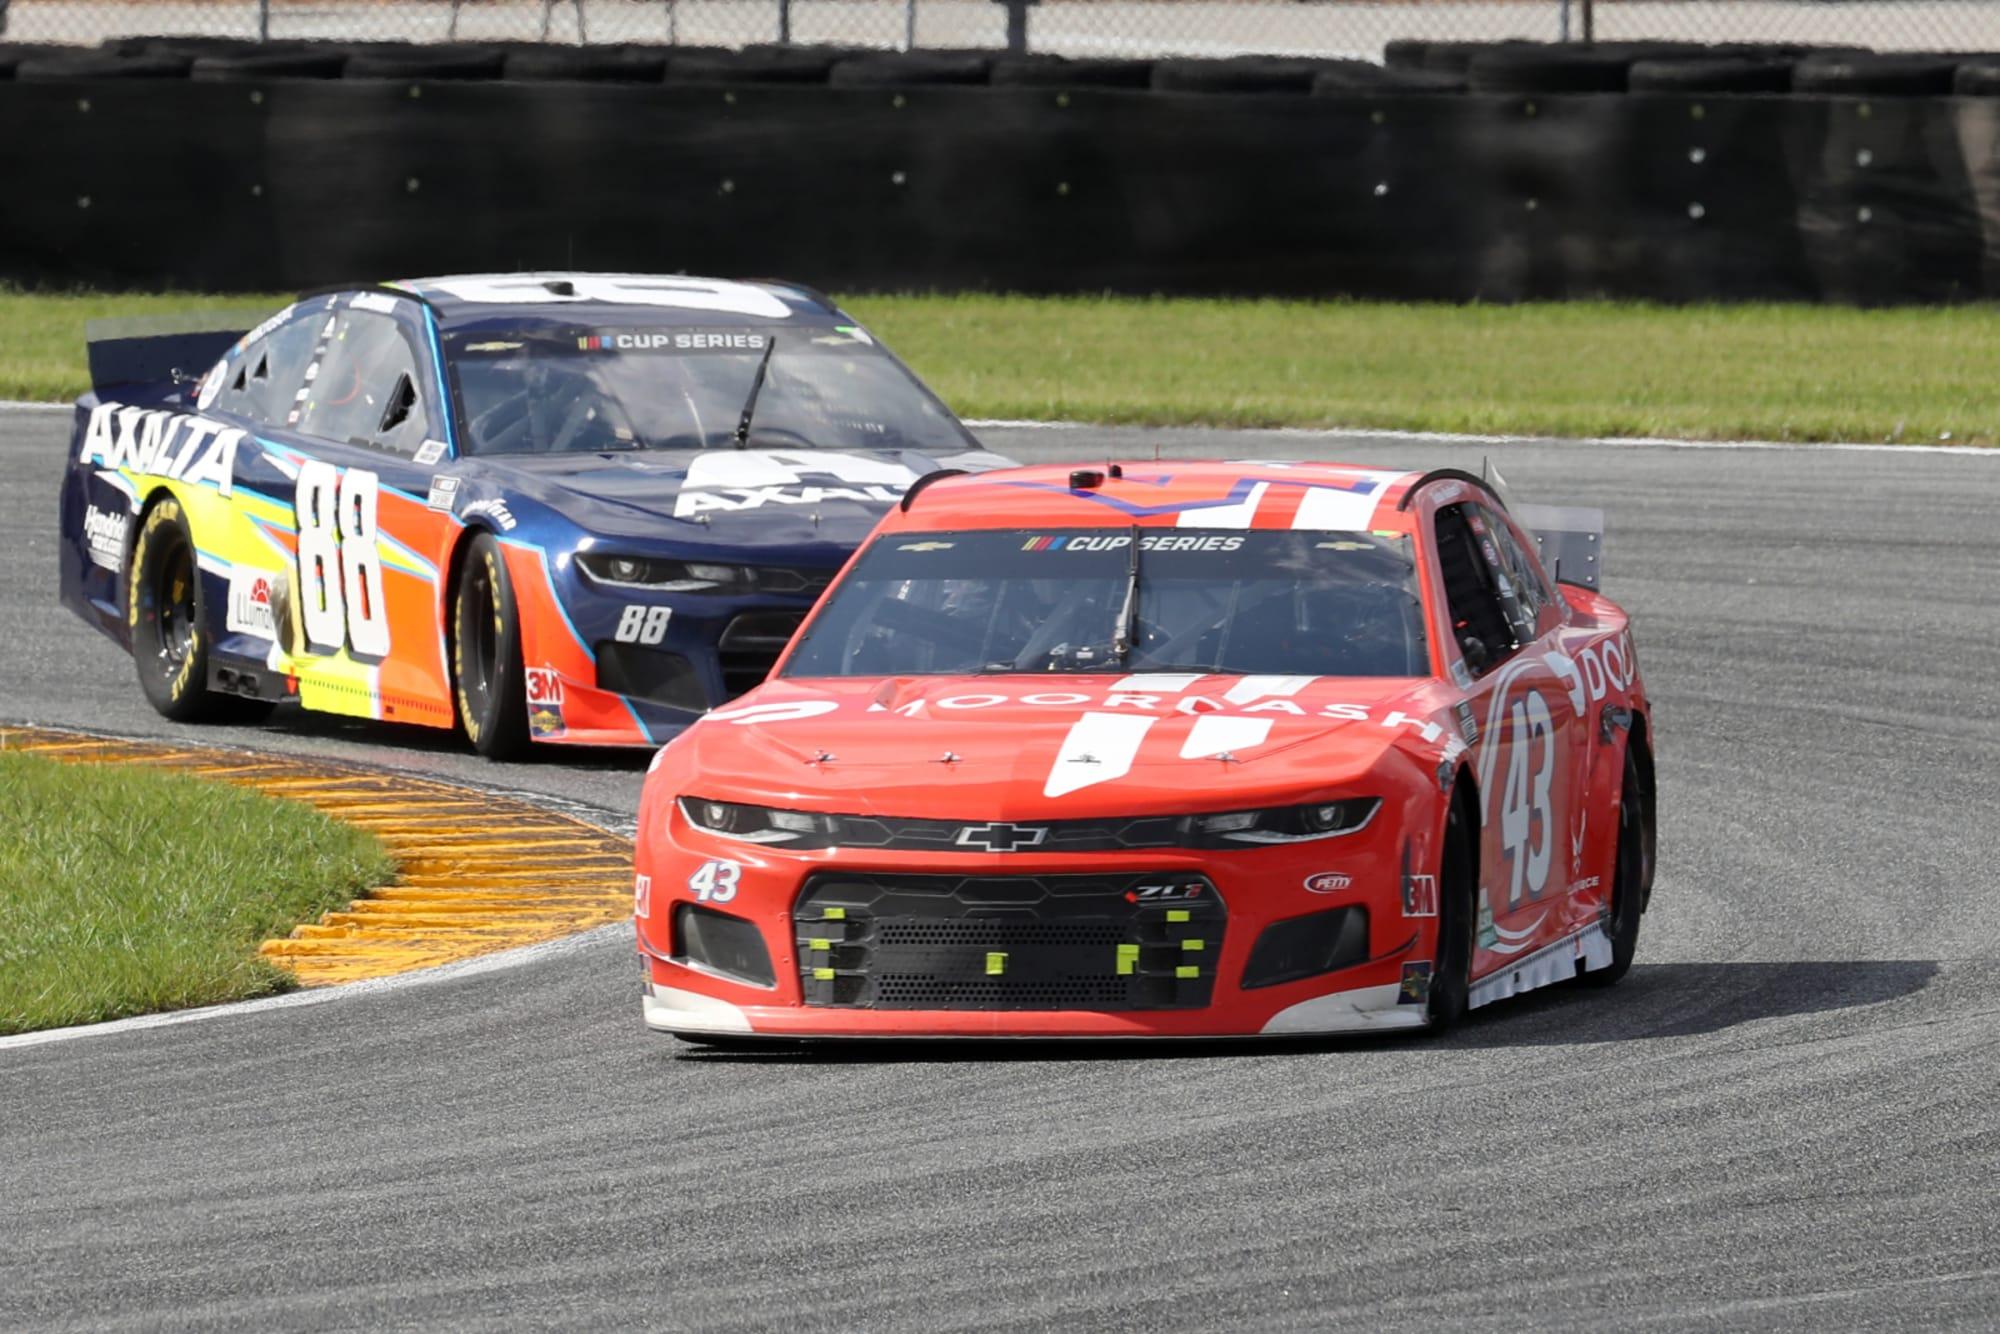 NASCAR: Top 5 seats still open for 2021